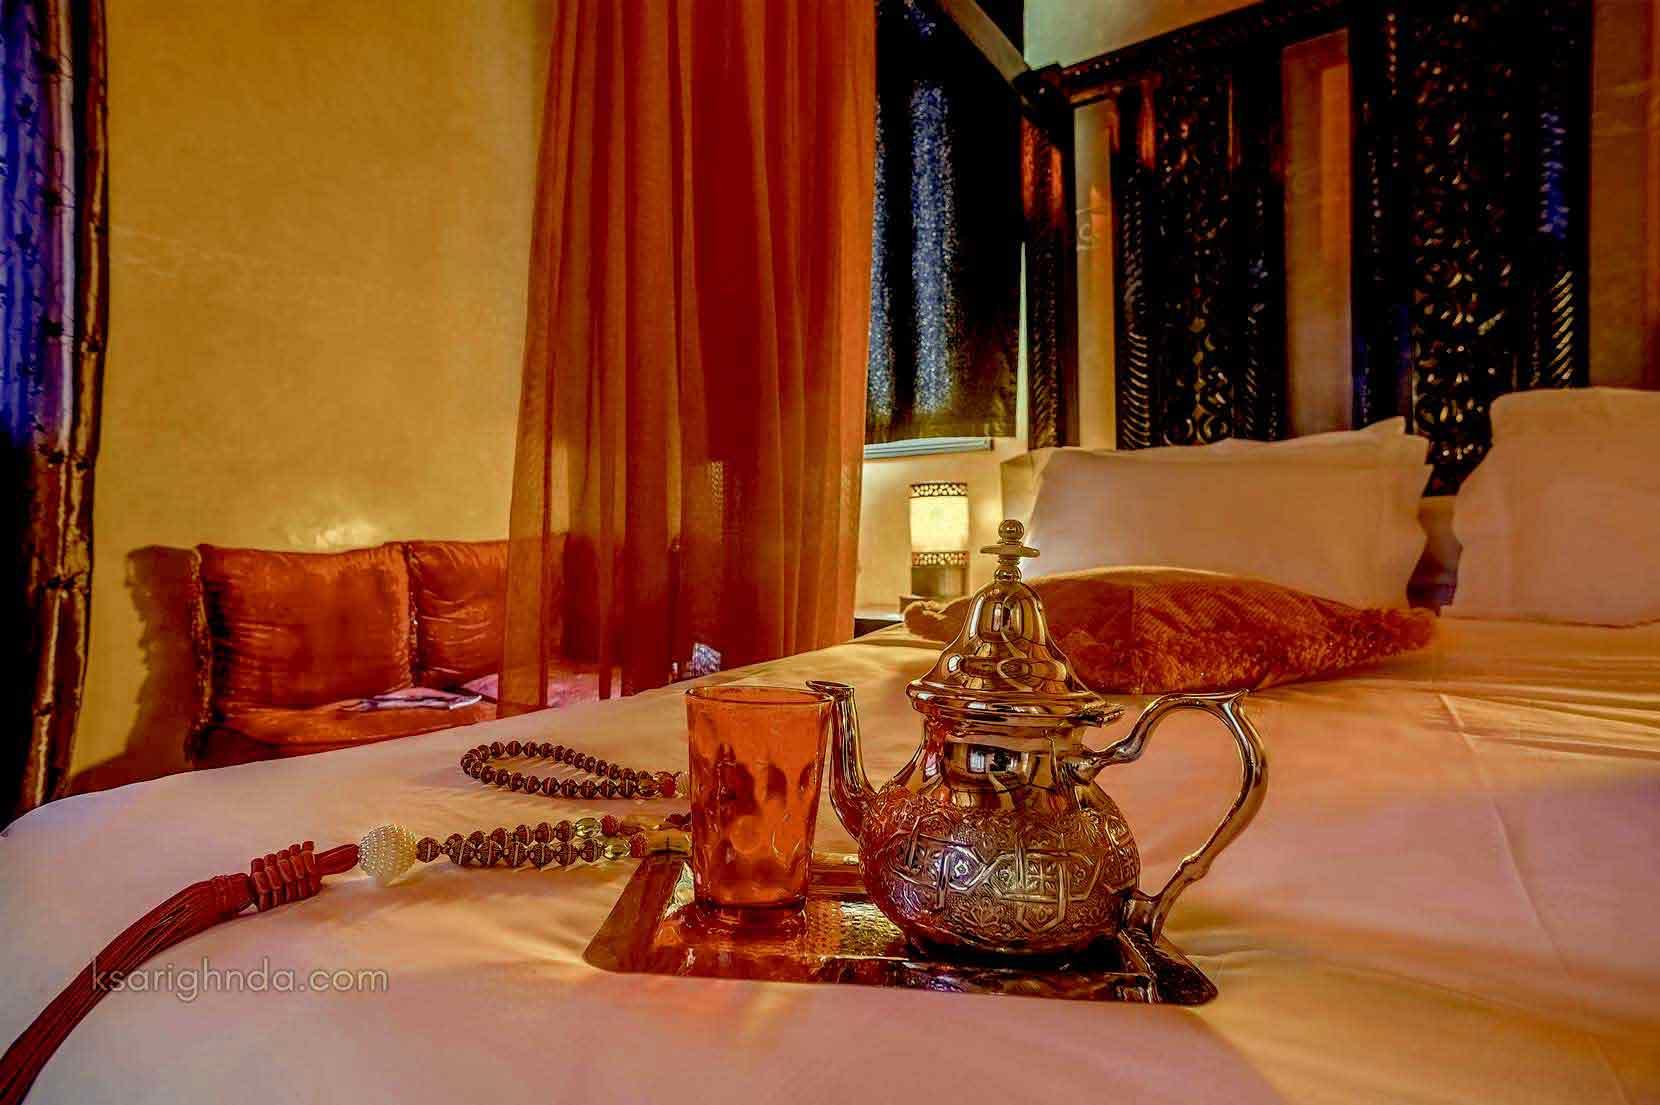 Décor Hôtel ksar Ighnda